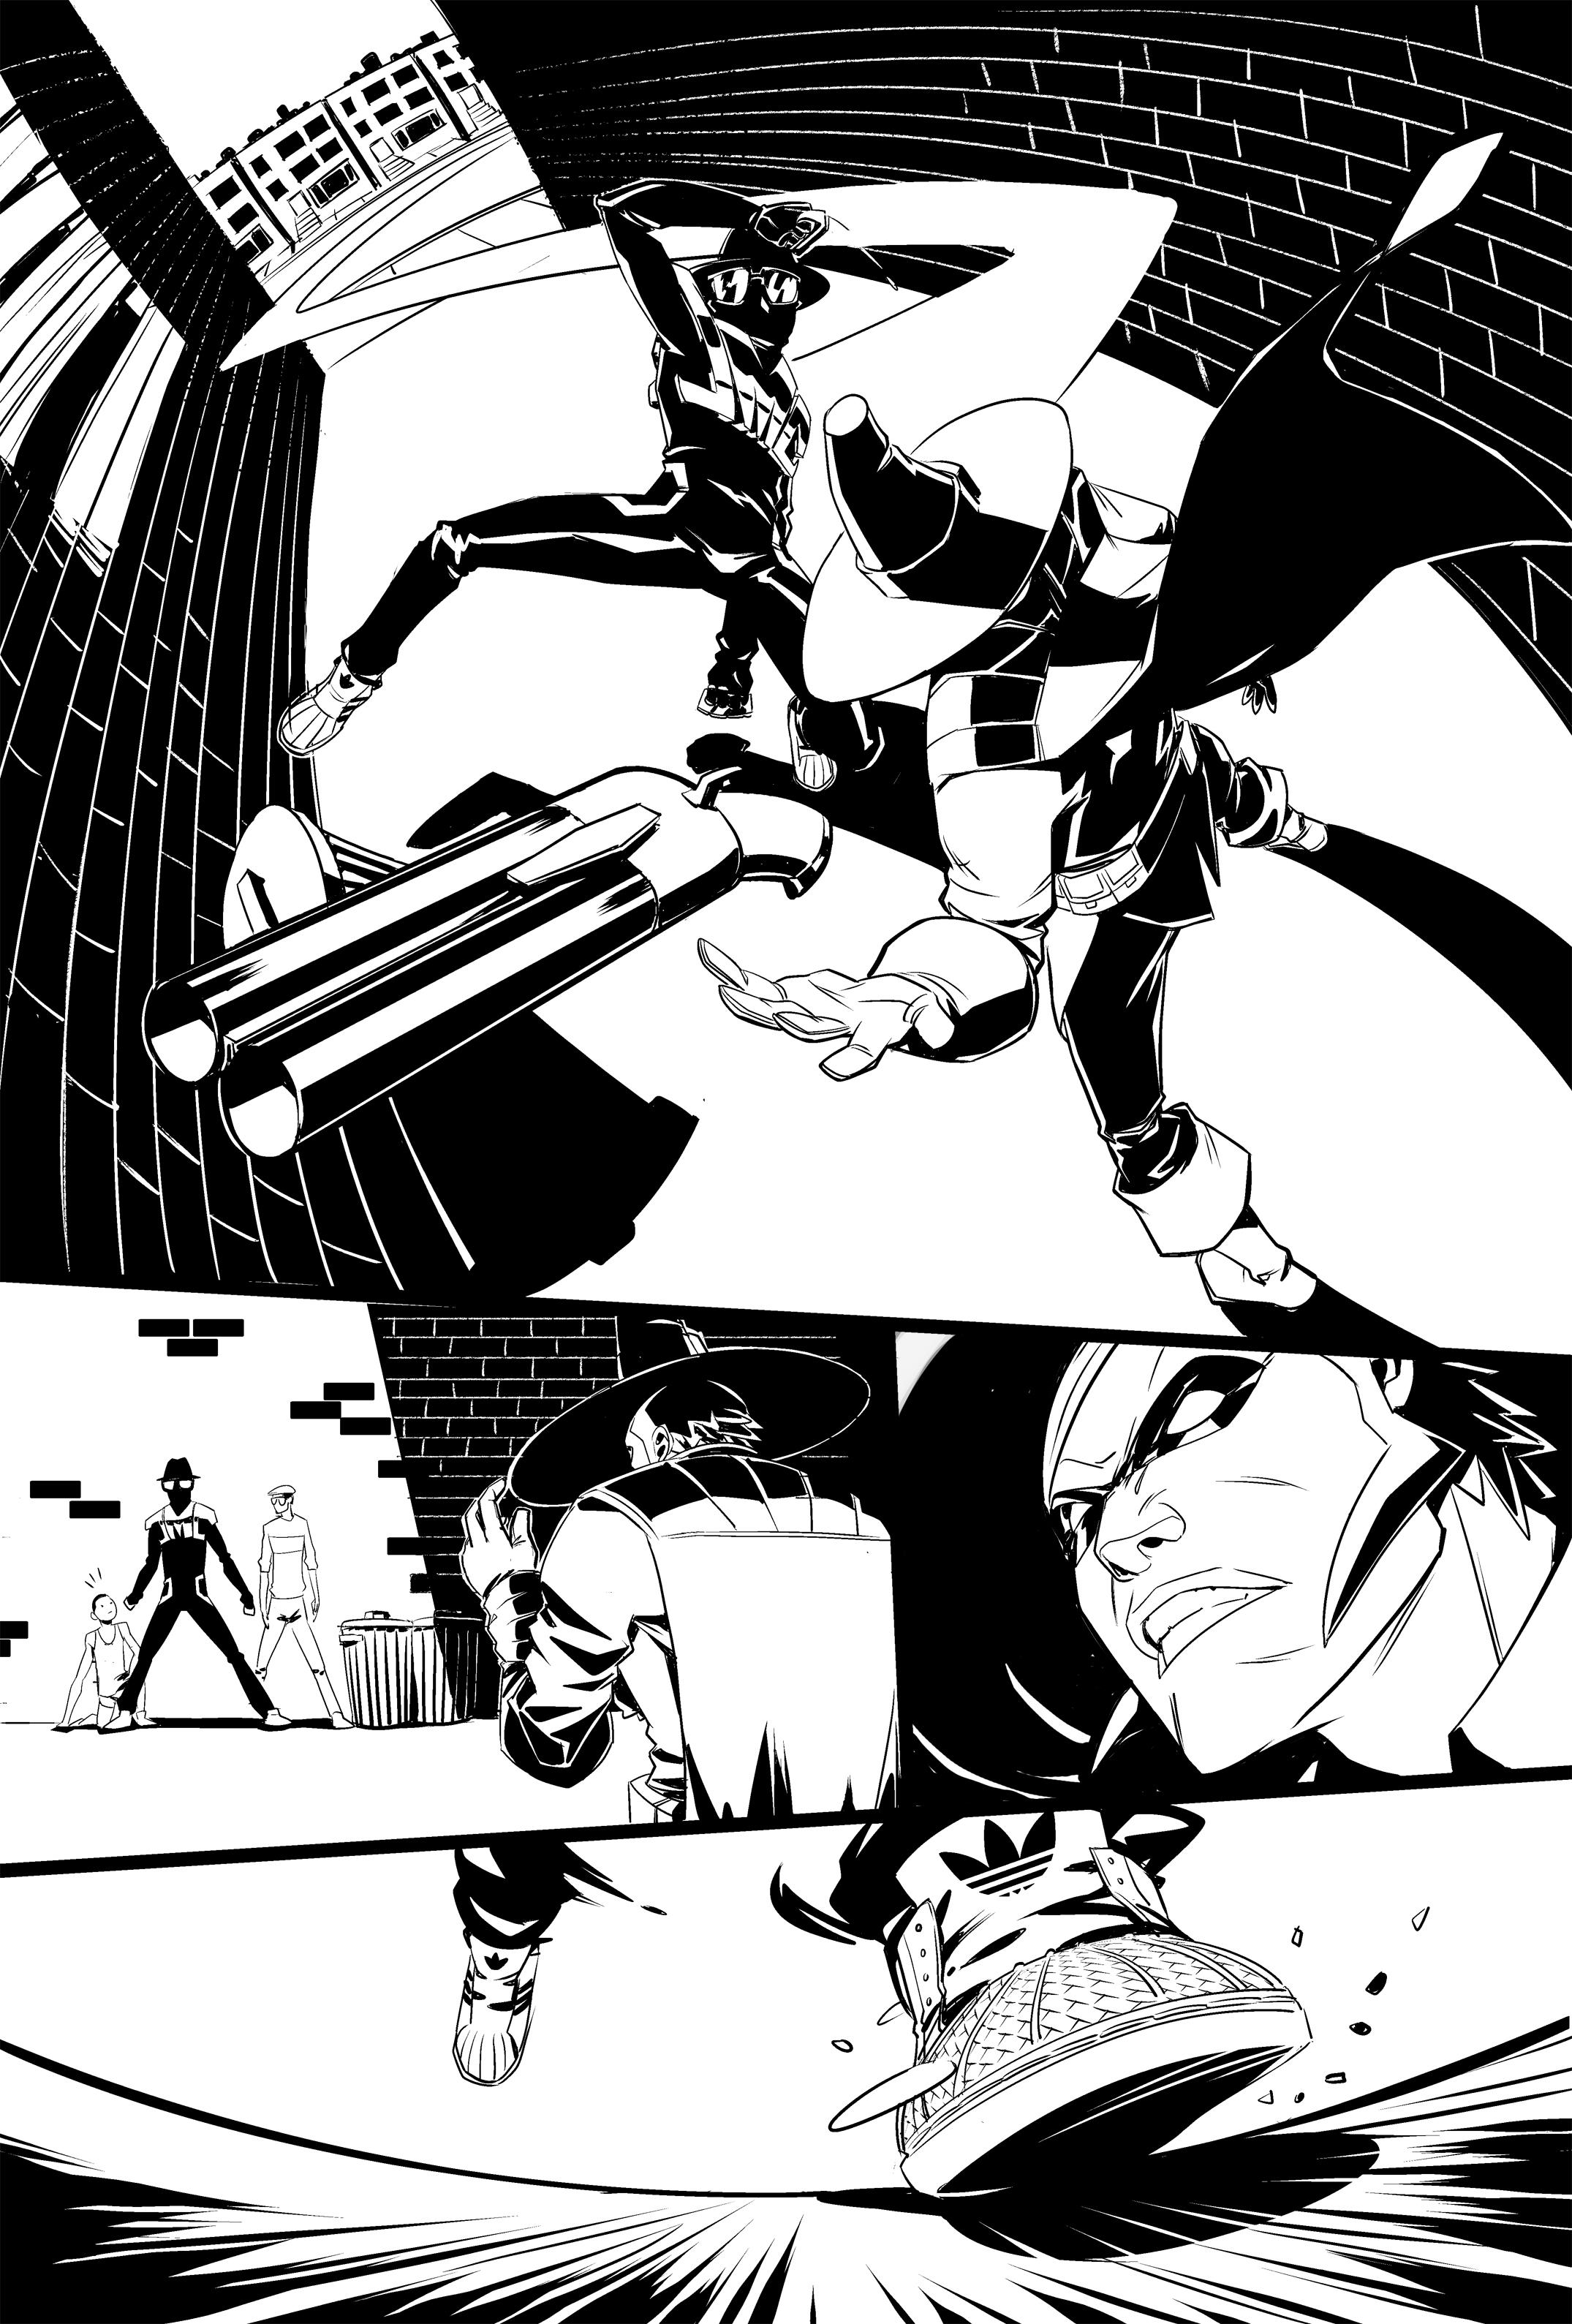 RUN DMC PAGE 3 (LINE ART)